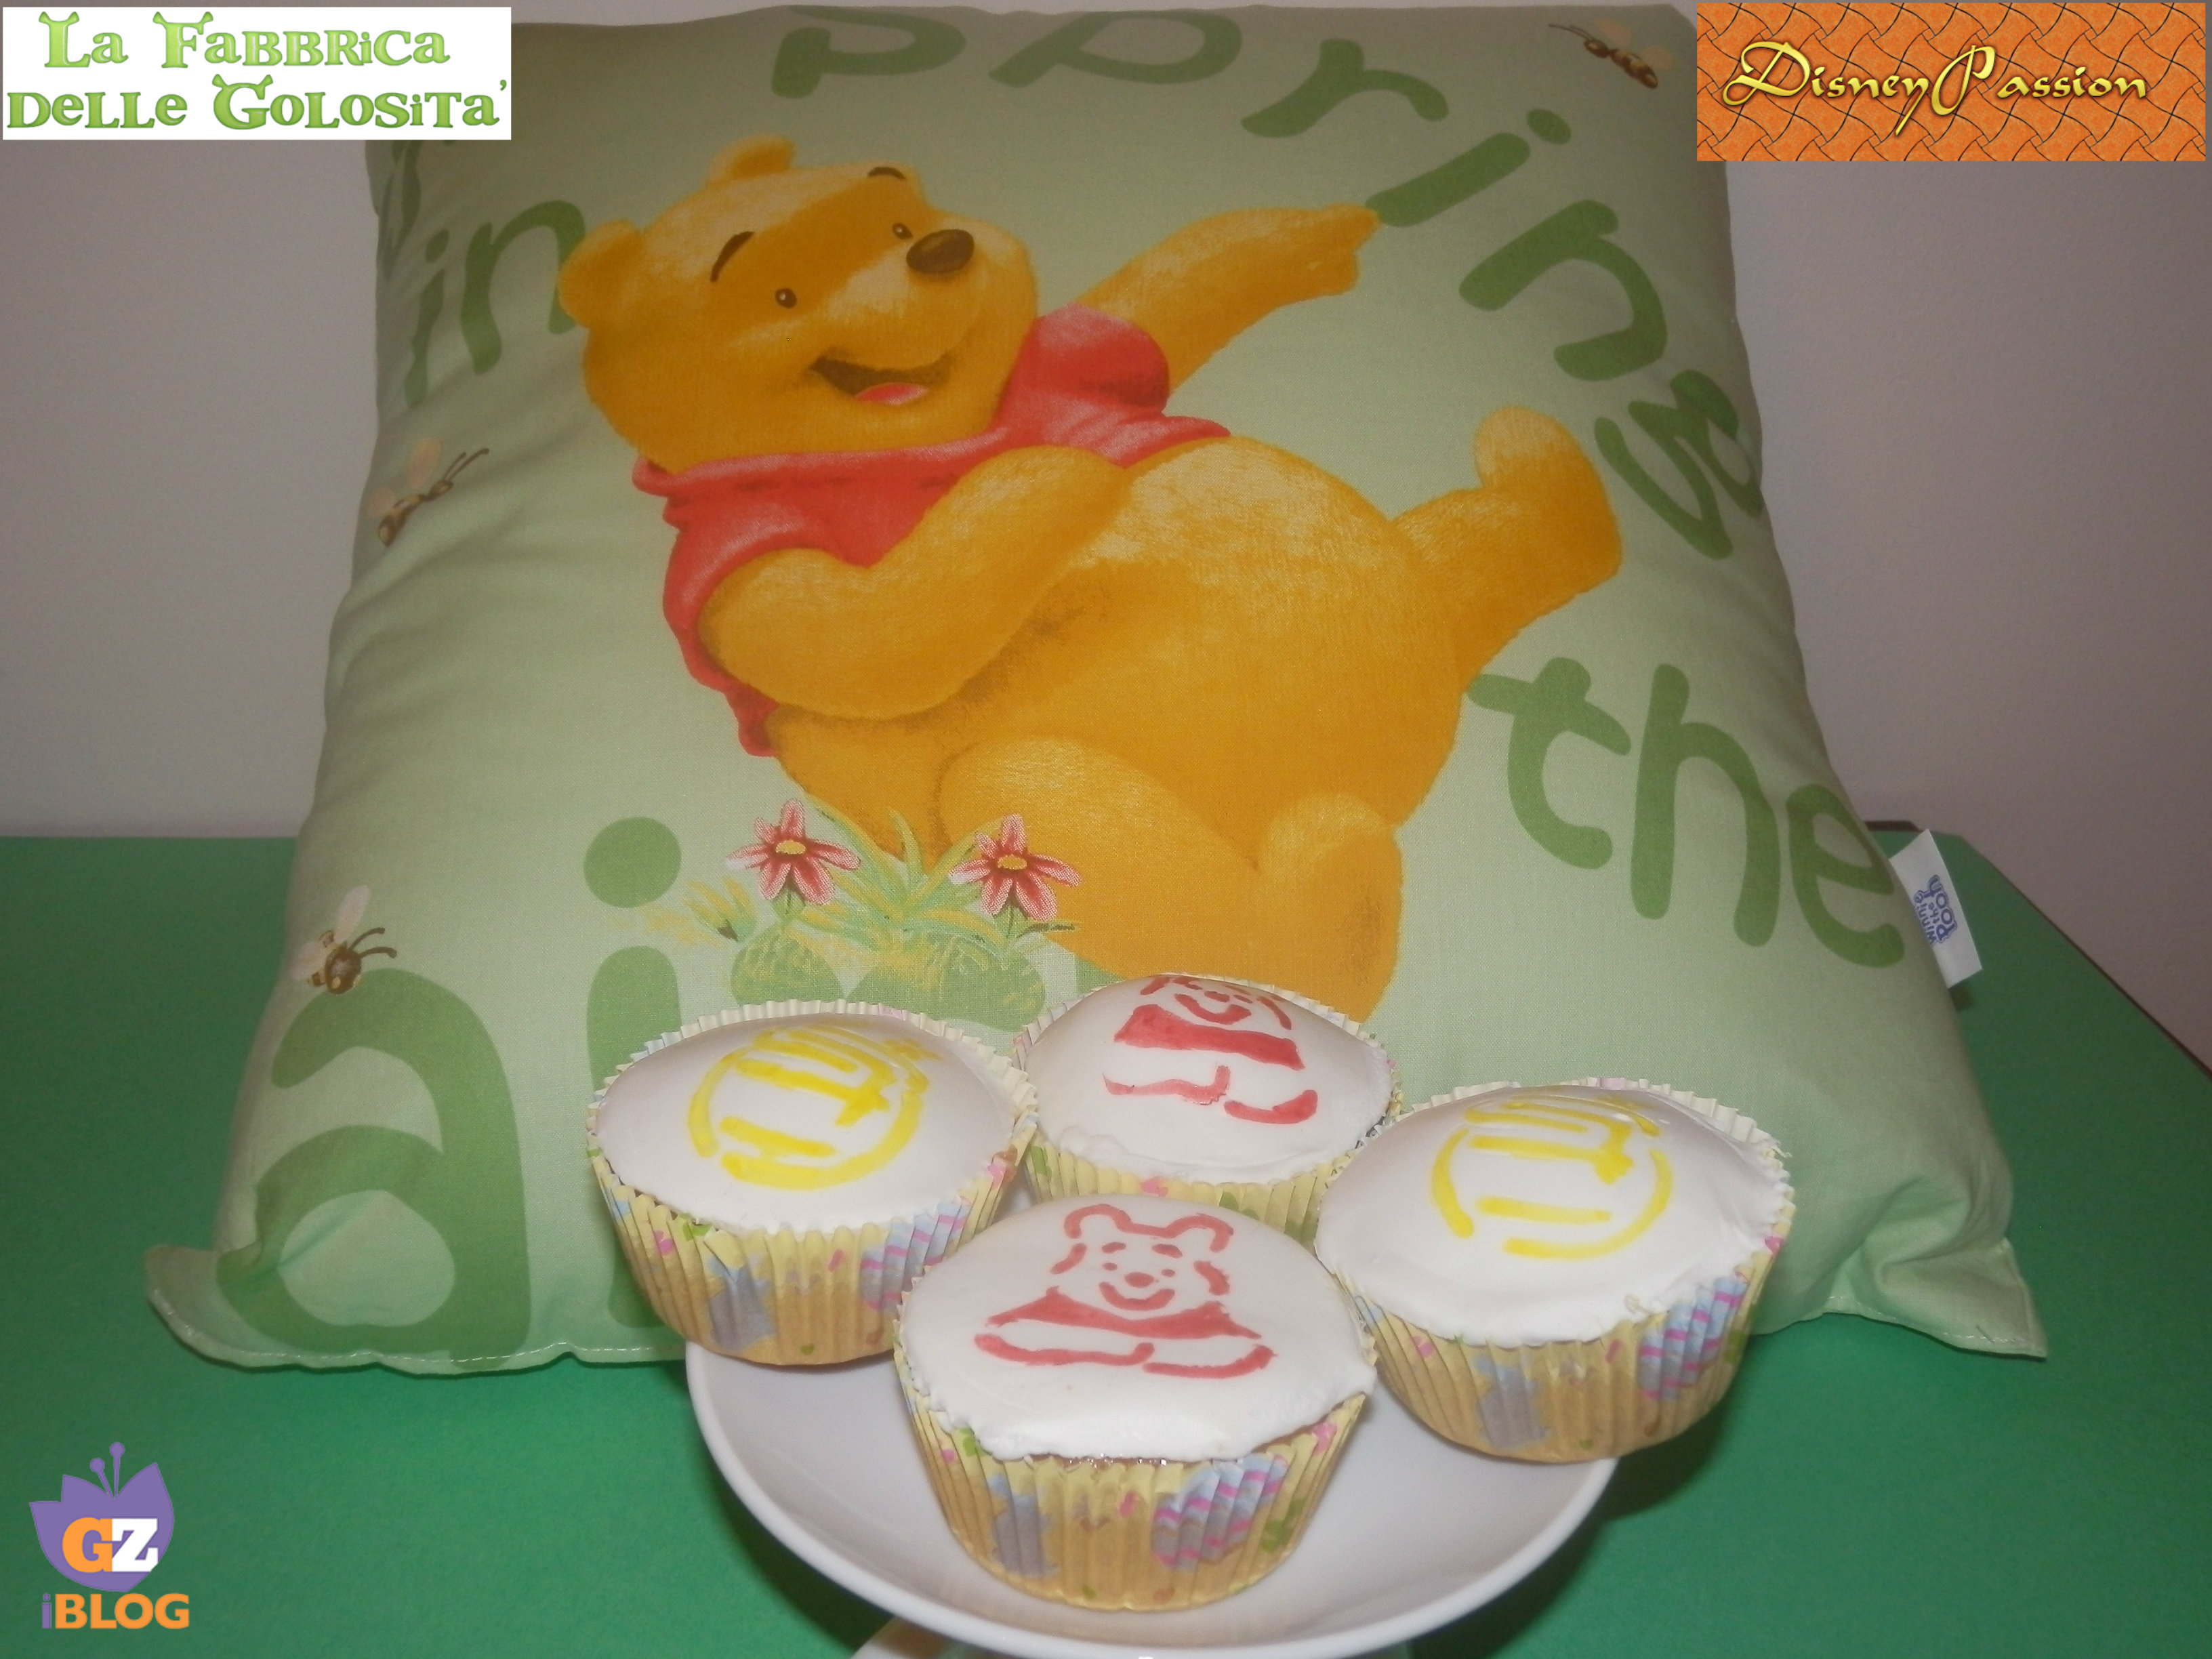 https://blog.giallozafferano.it/lafabbricadelleg/wp-content/uploads/2014/10/Cupcake-al-Miele-di-Winnie-Pooh.jpg